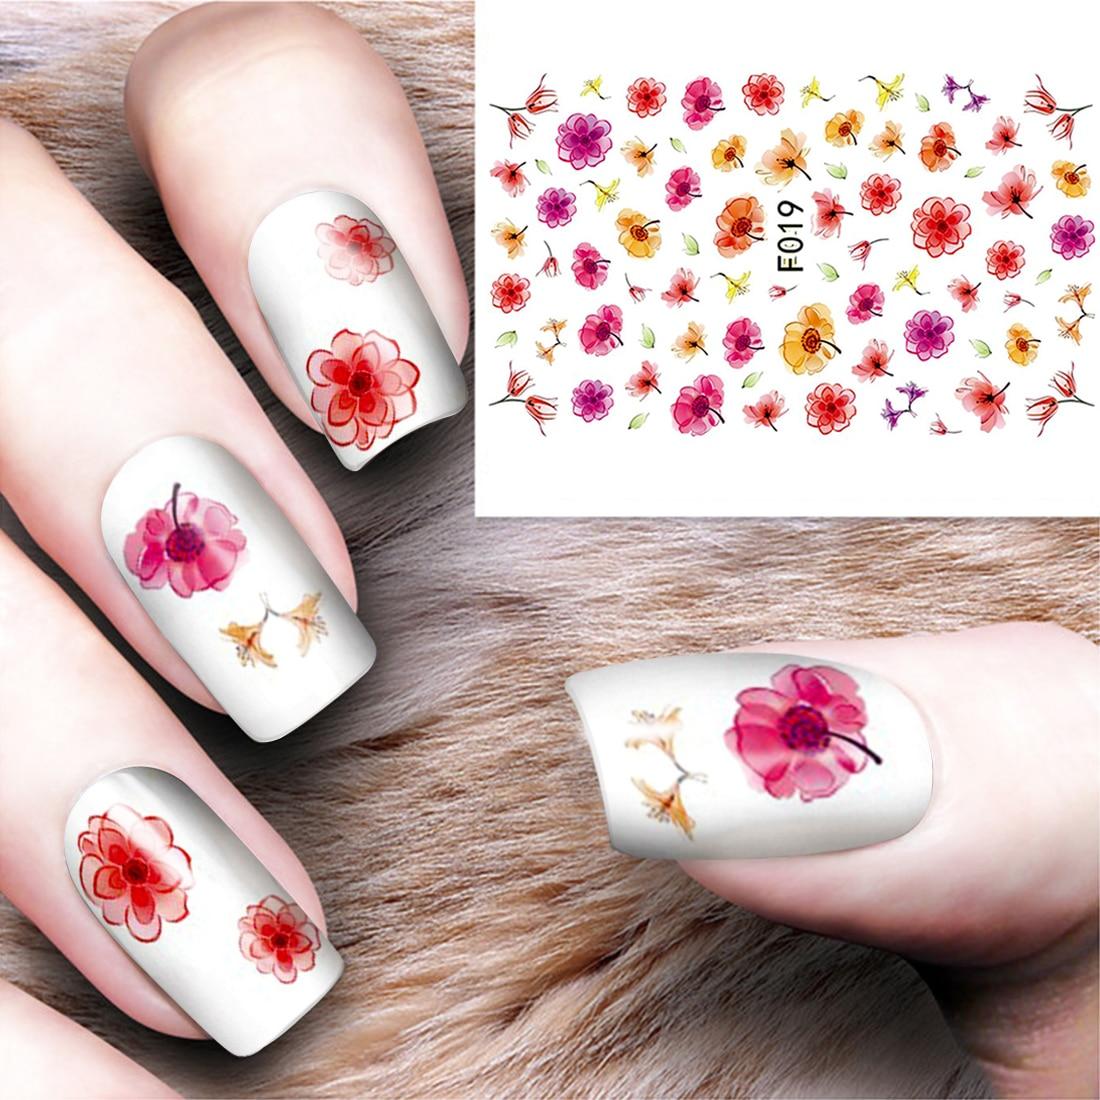 Girly Nail Art: Aliexpress.com : Buy Cute Nail Art Manicure Wraps Tools 1